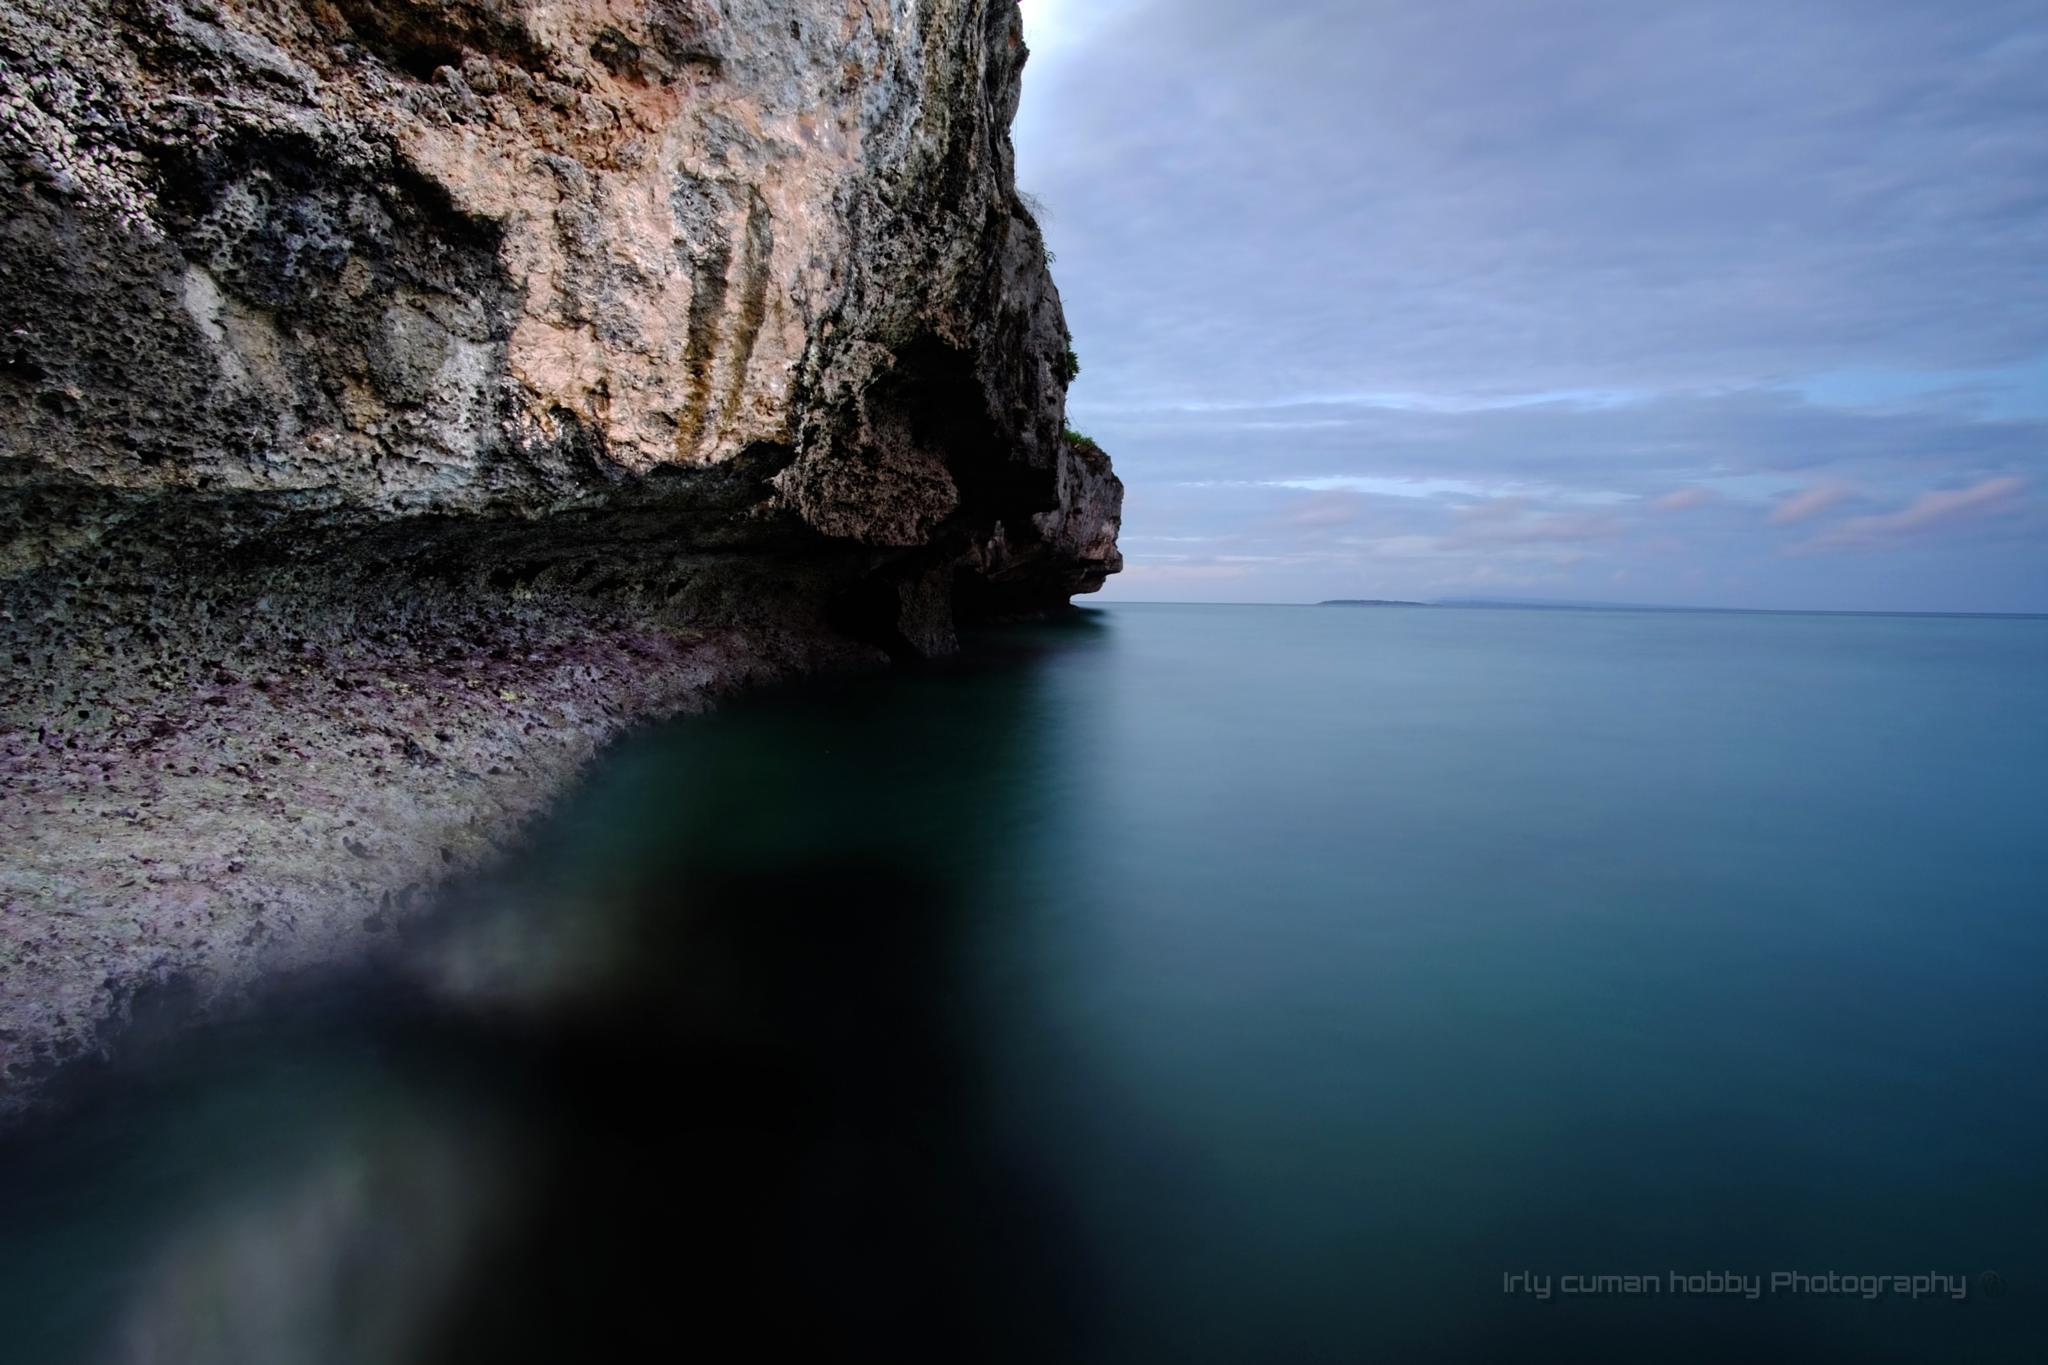 Amatoa resort by Irli